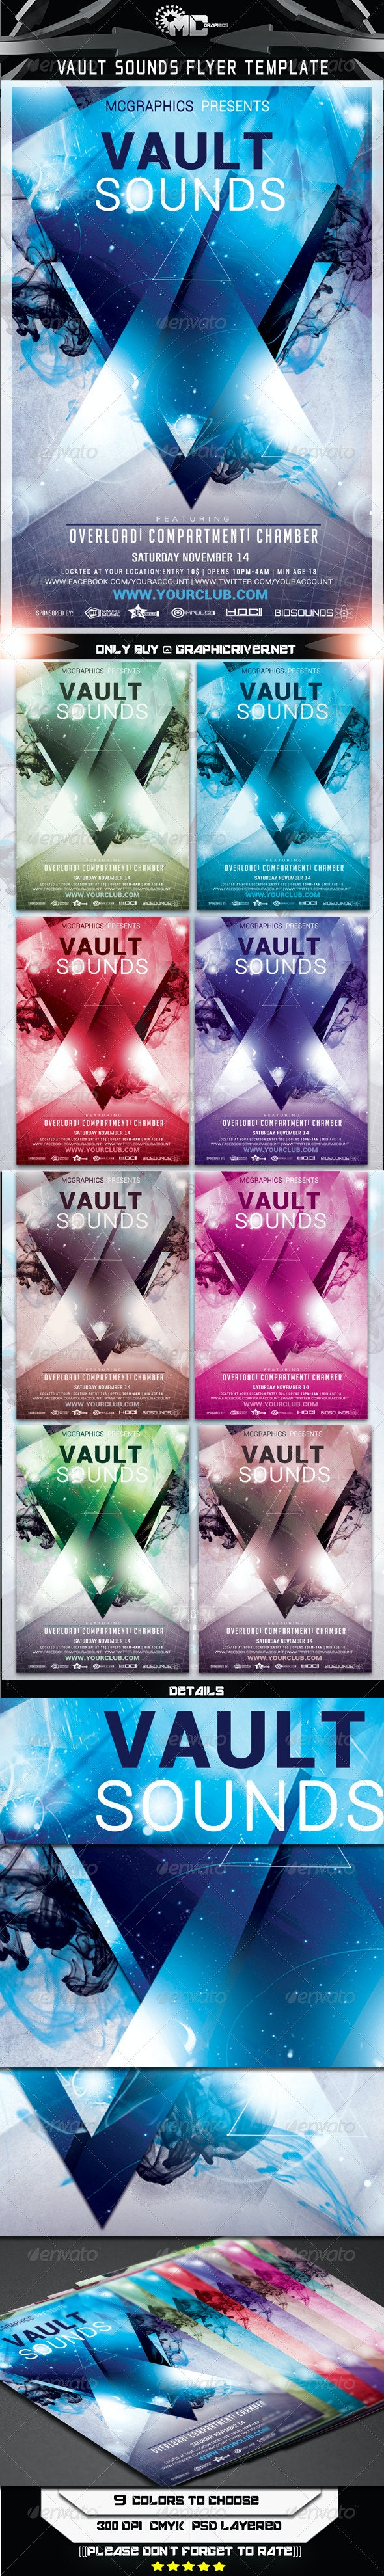 Vault Sounds Flyer Template - Flyers Print Templates